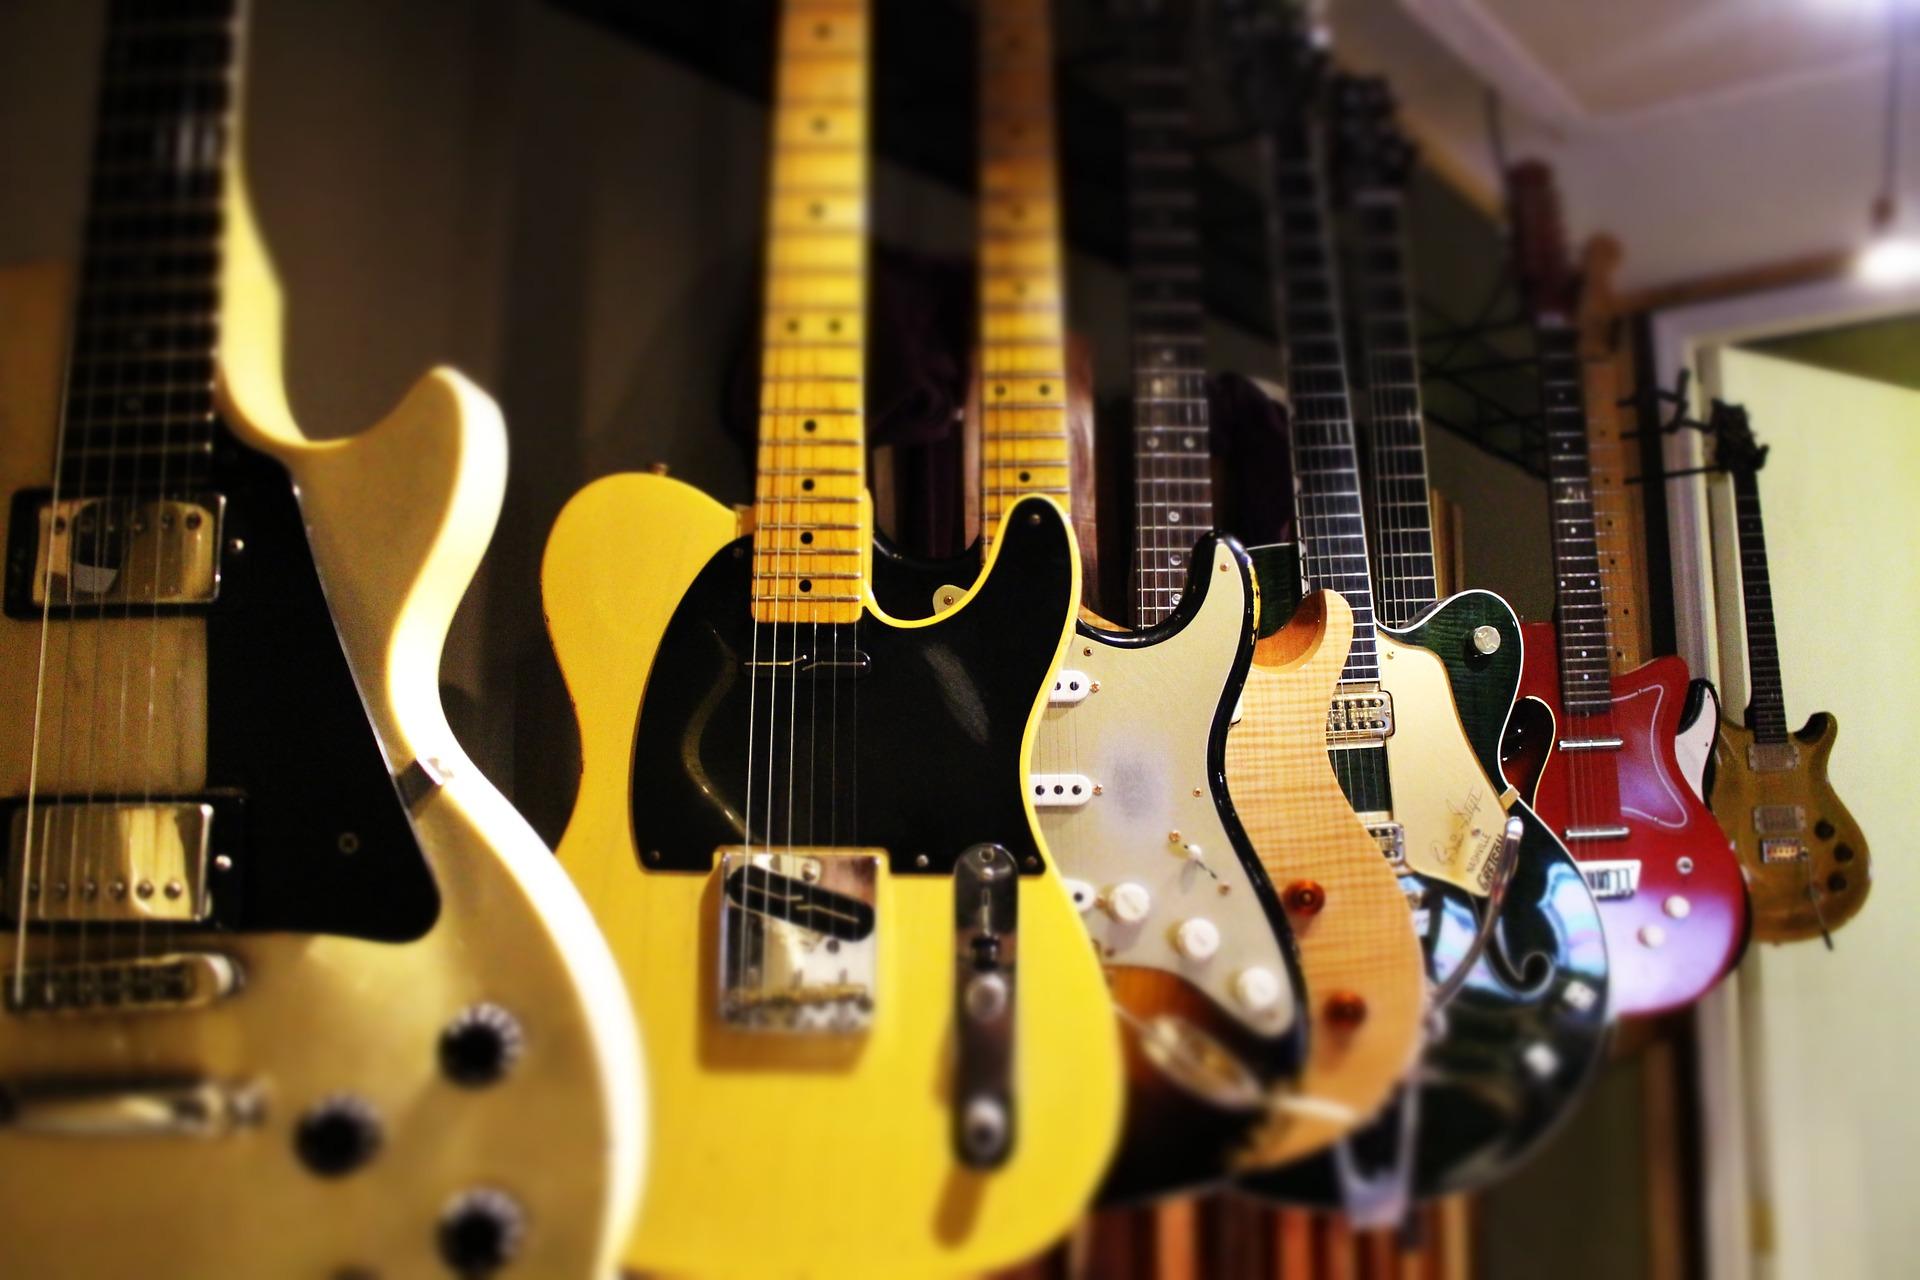 guitars-1506718_1920.jpg